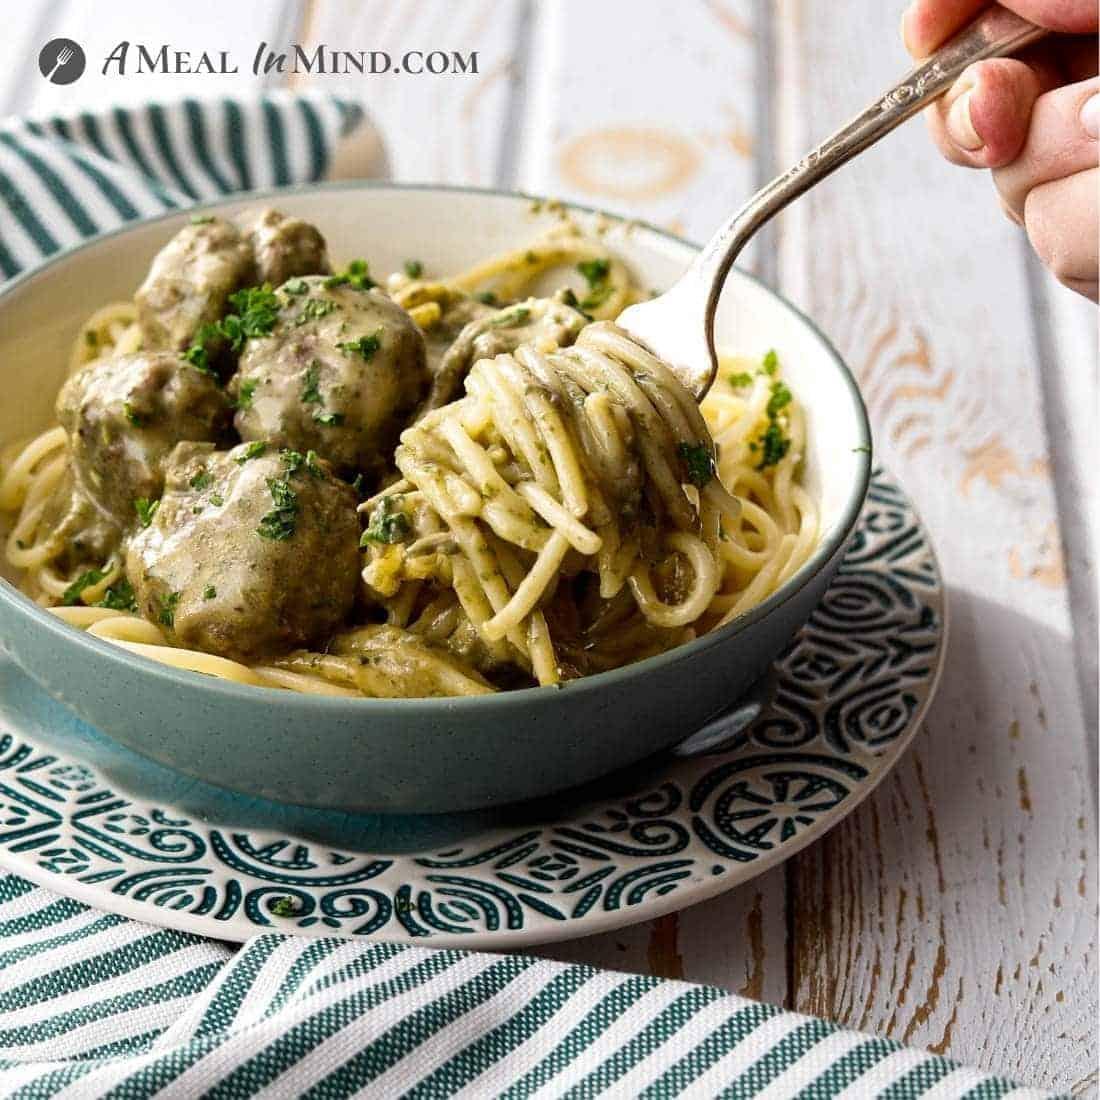 Paleo Pesto Meatballs and Alfredo Sauce in bowl on gf pasta